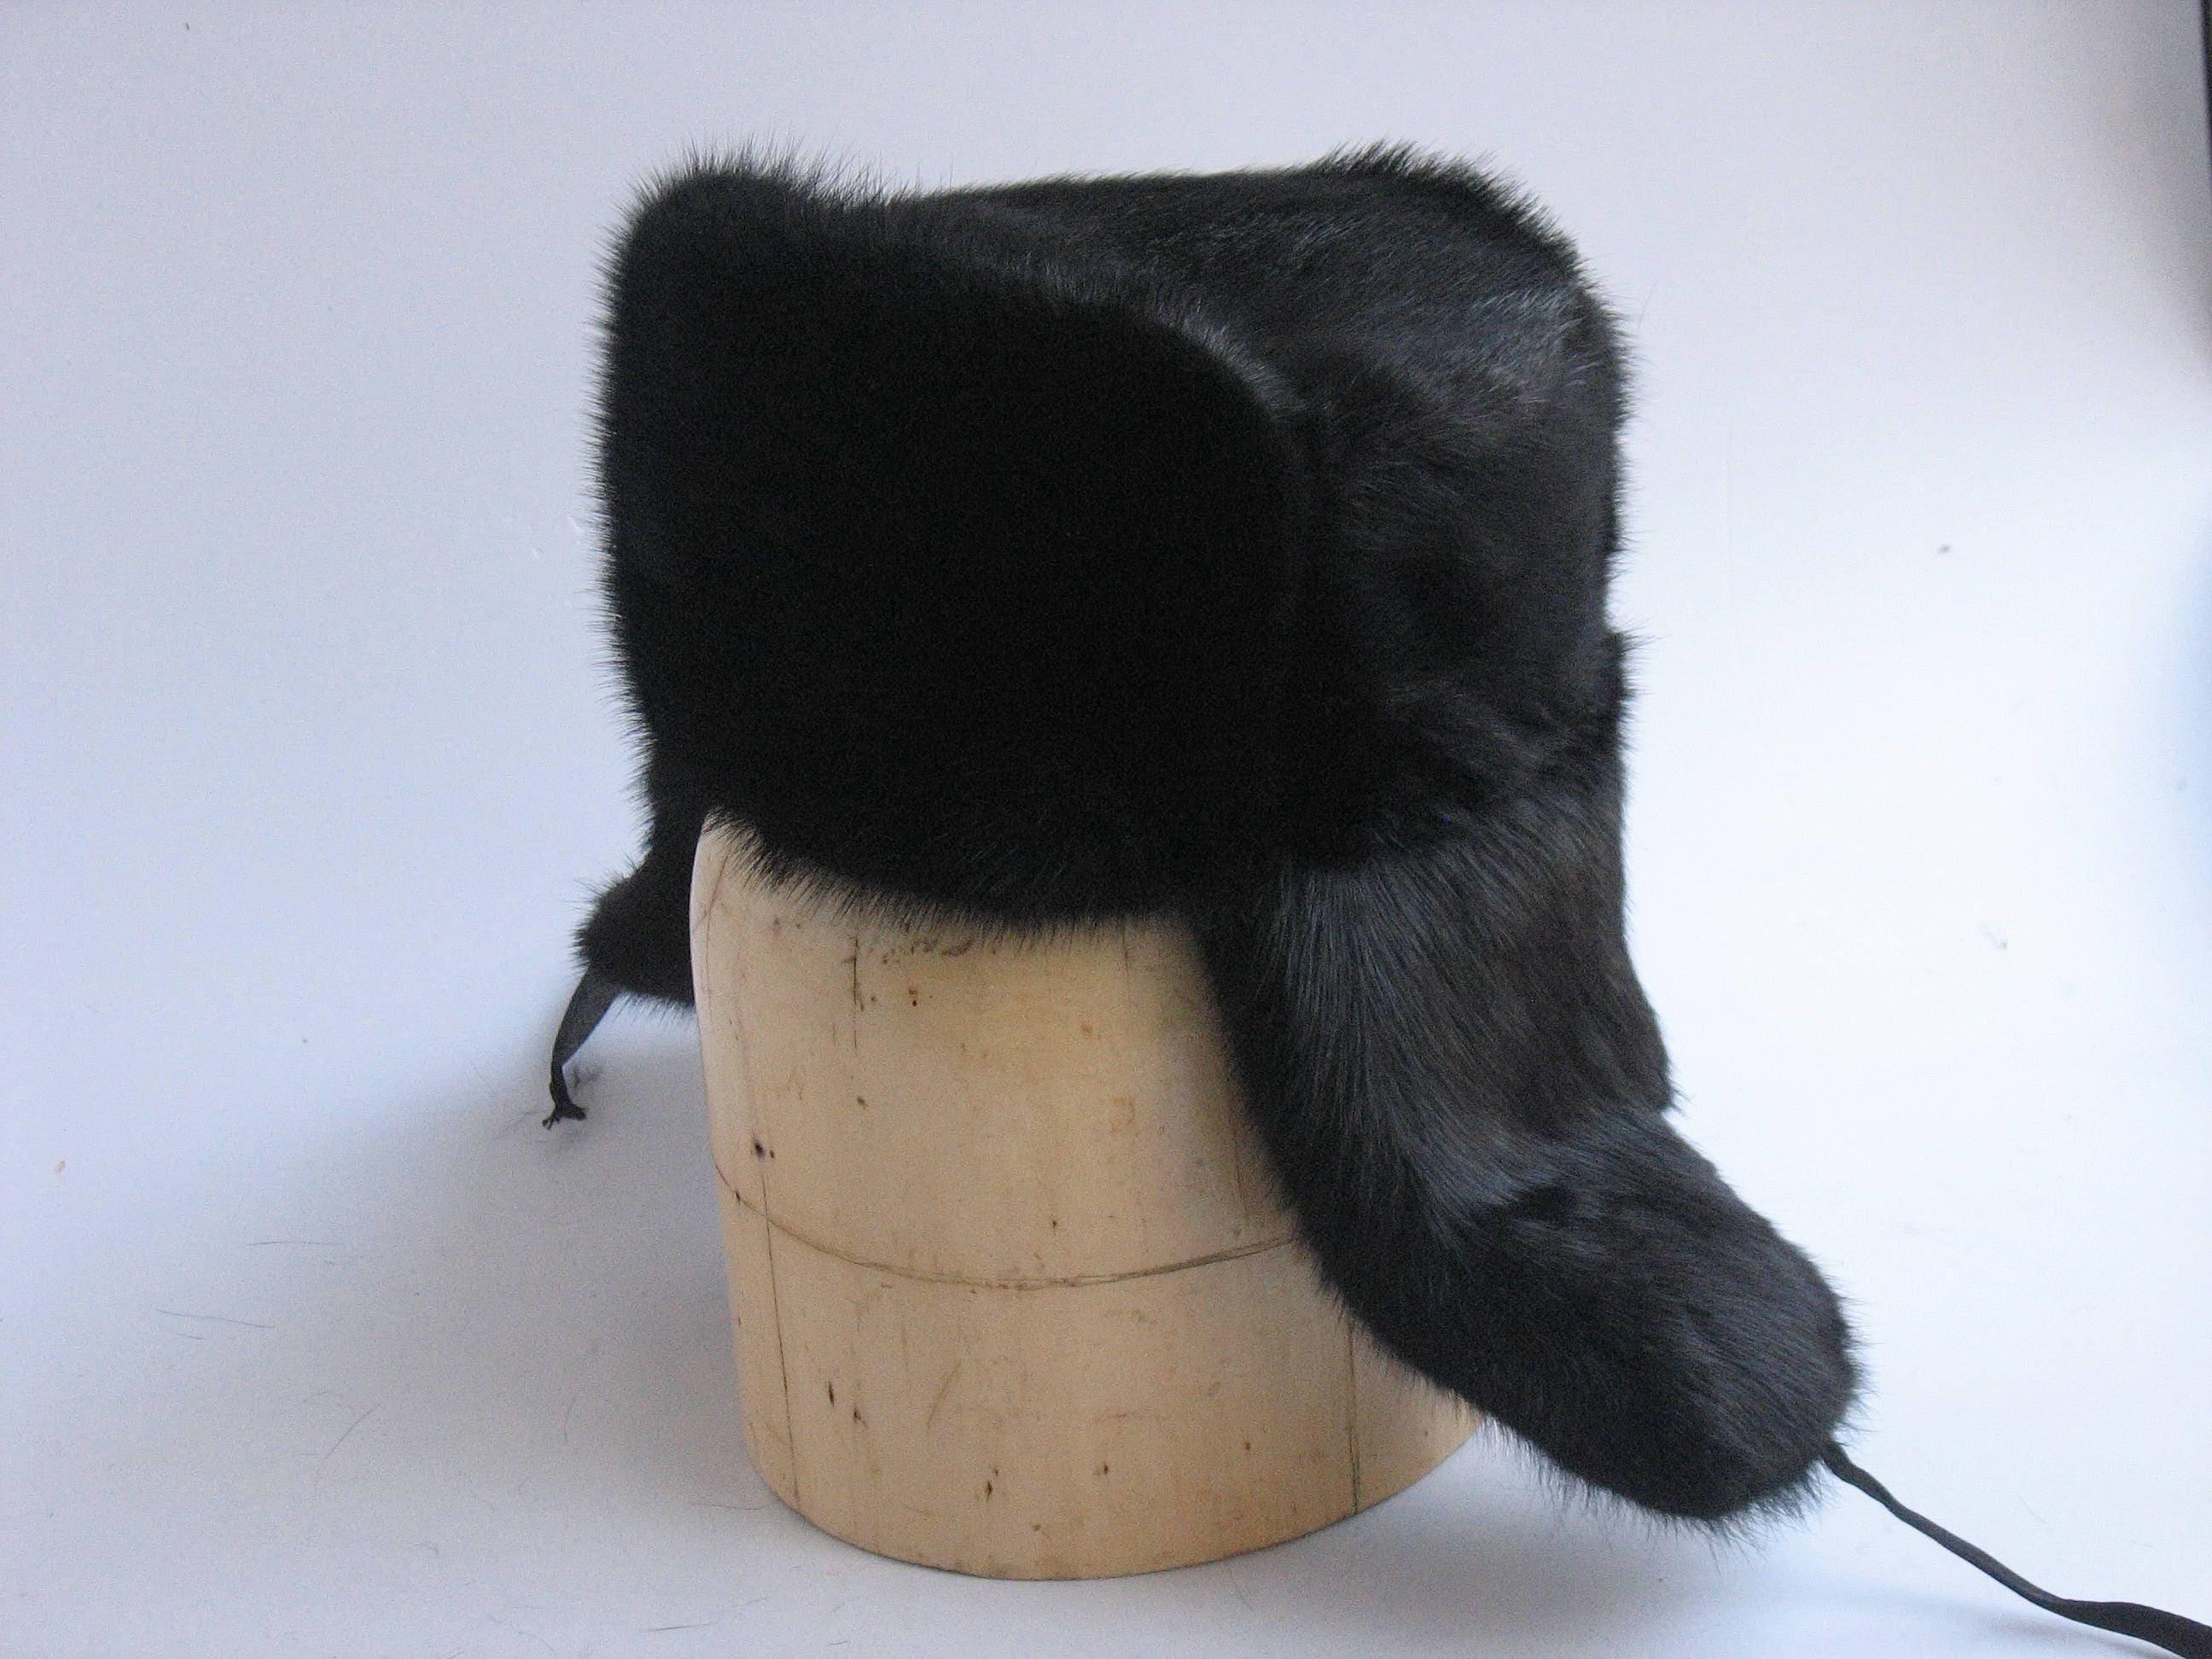 de8d1a6f78 Fur hat men Ushanka Russian fur hat Military muskrat hat made